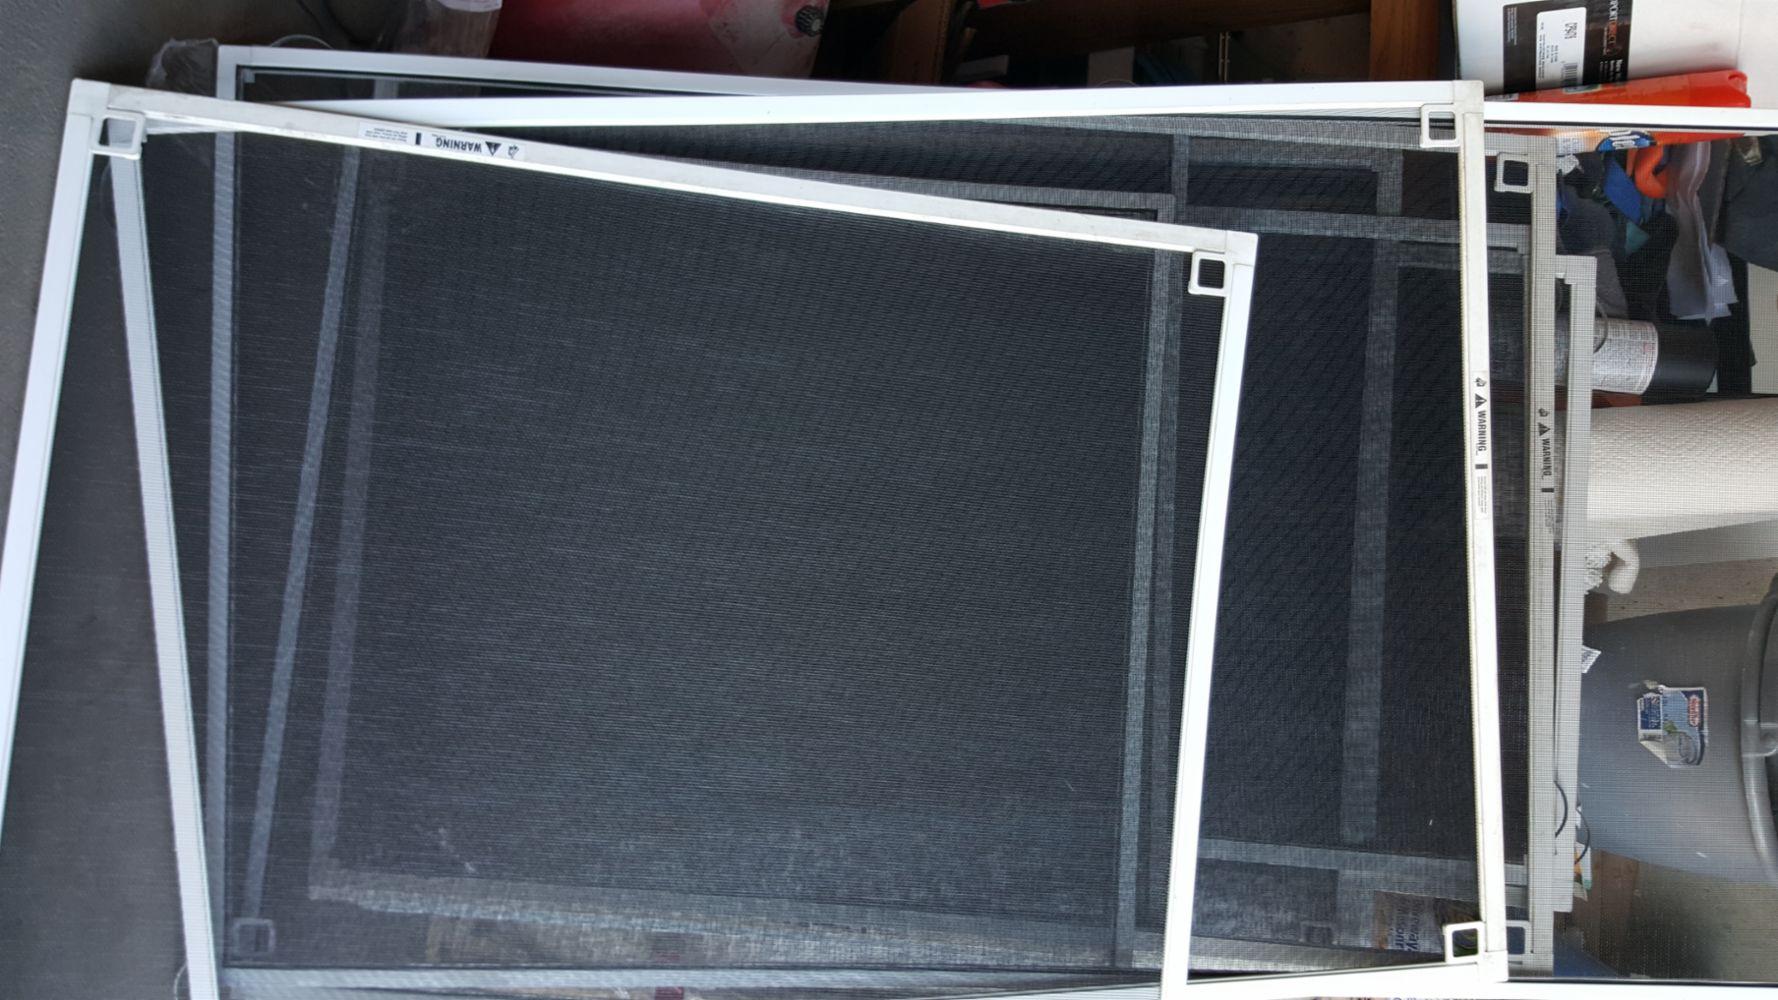 Window screen repair and installation in prescott valley for Window screen repair